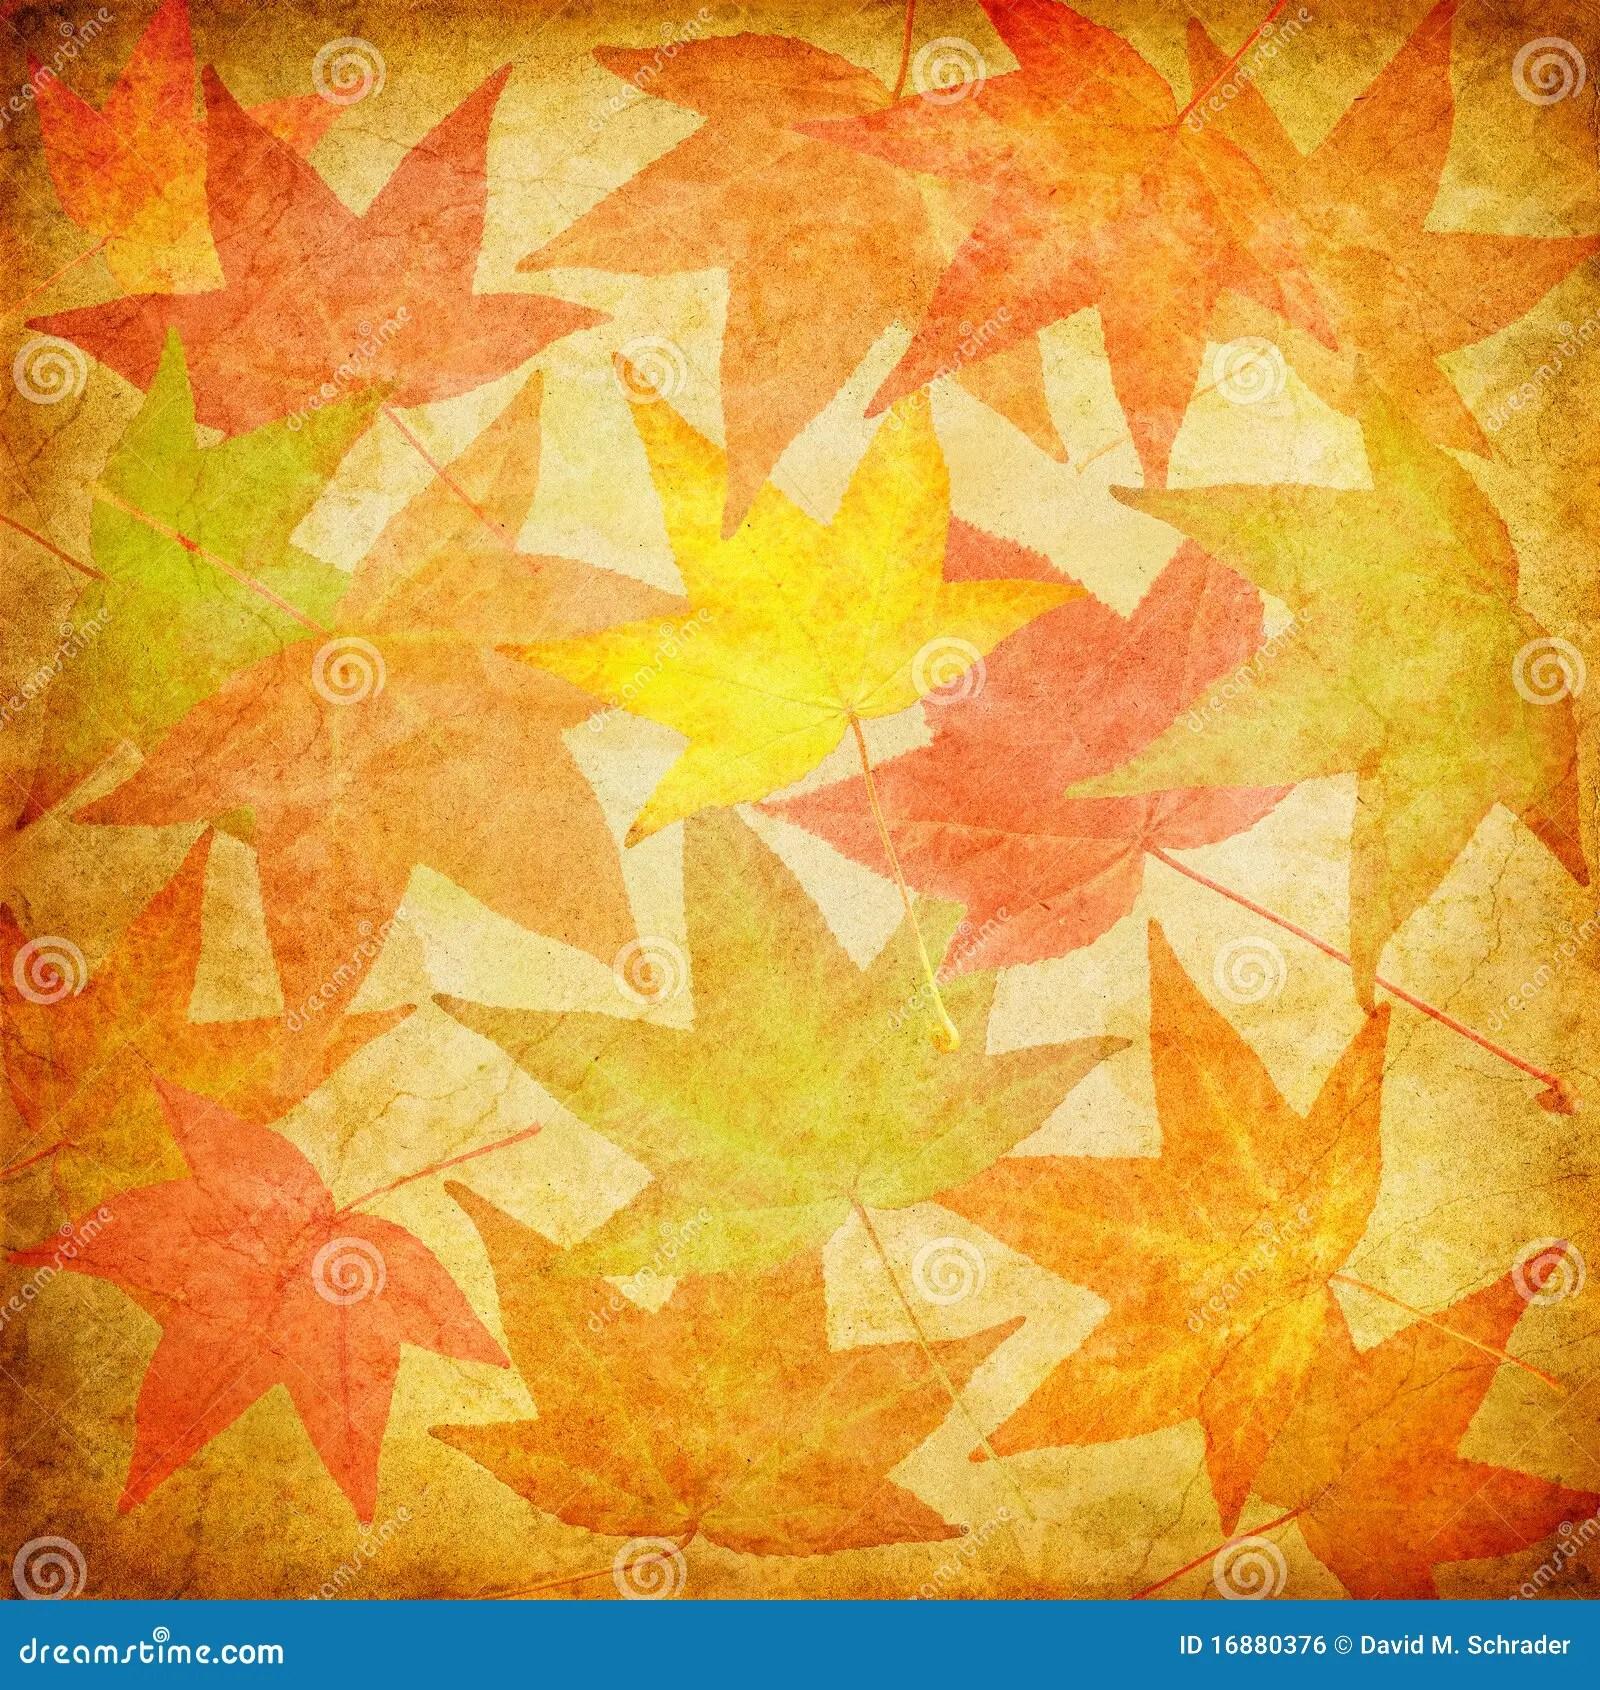 Fall Desktop Wallpaper For Mac Vintage Fall Leaves Royalty Free Stock Image Image 16880376